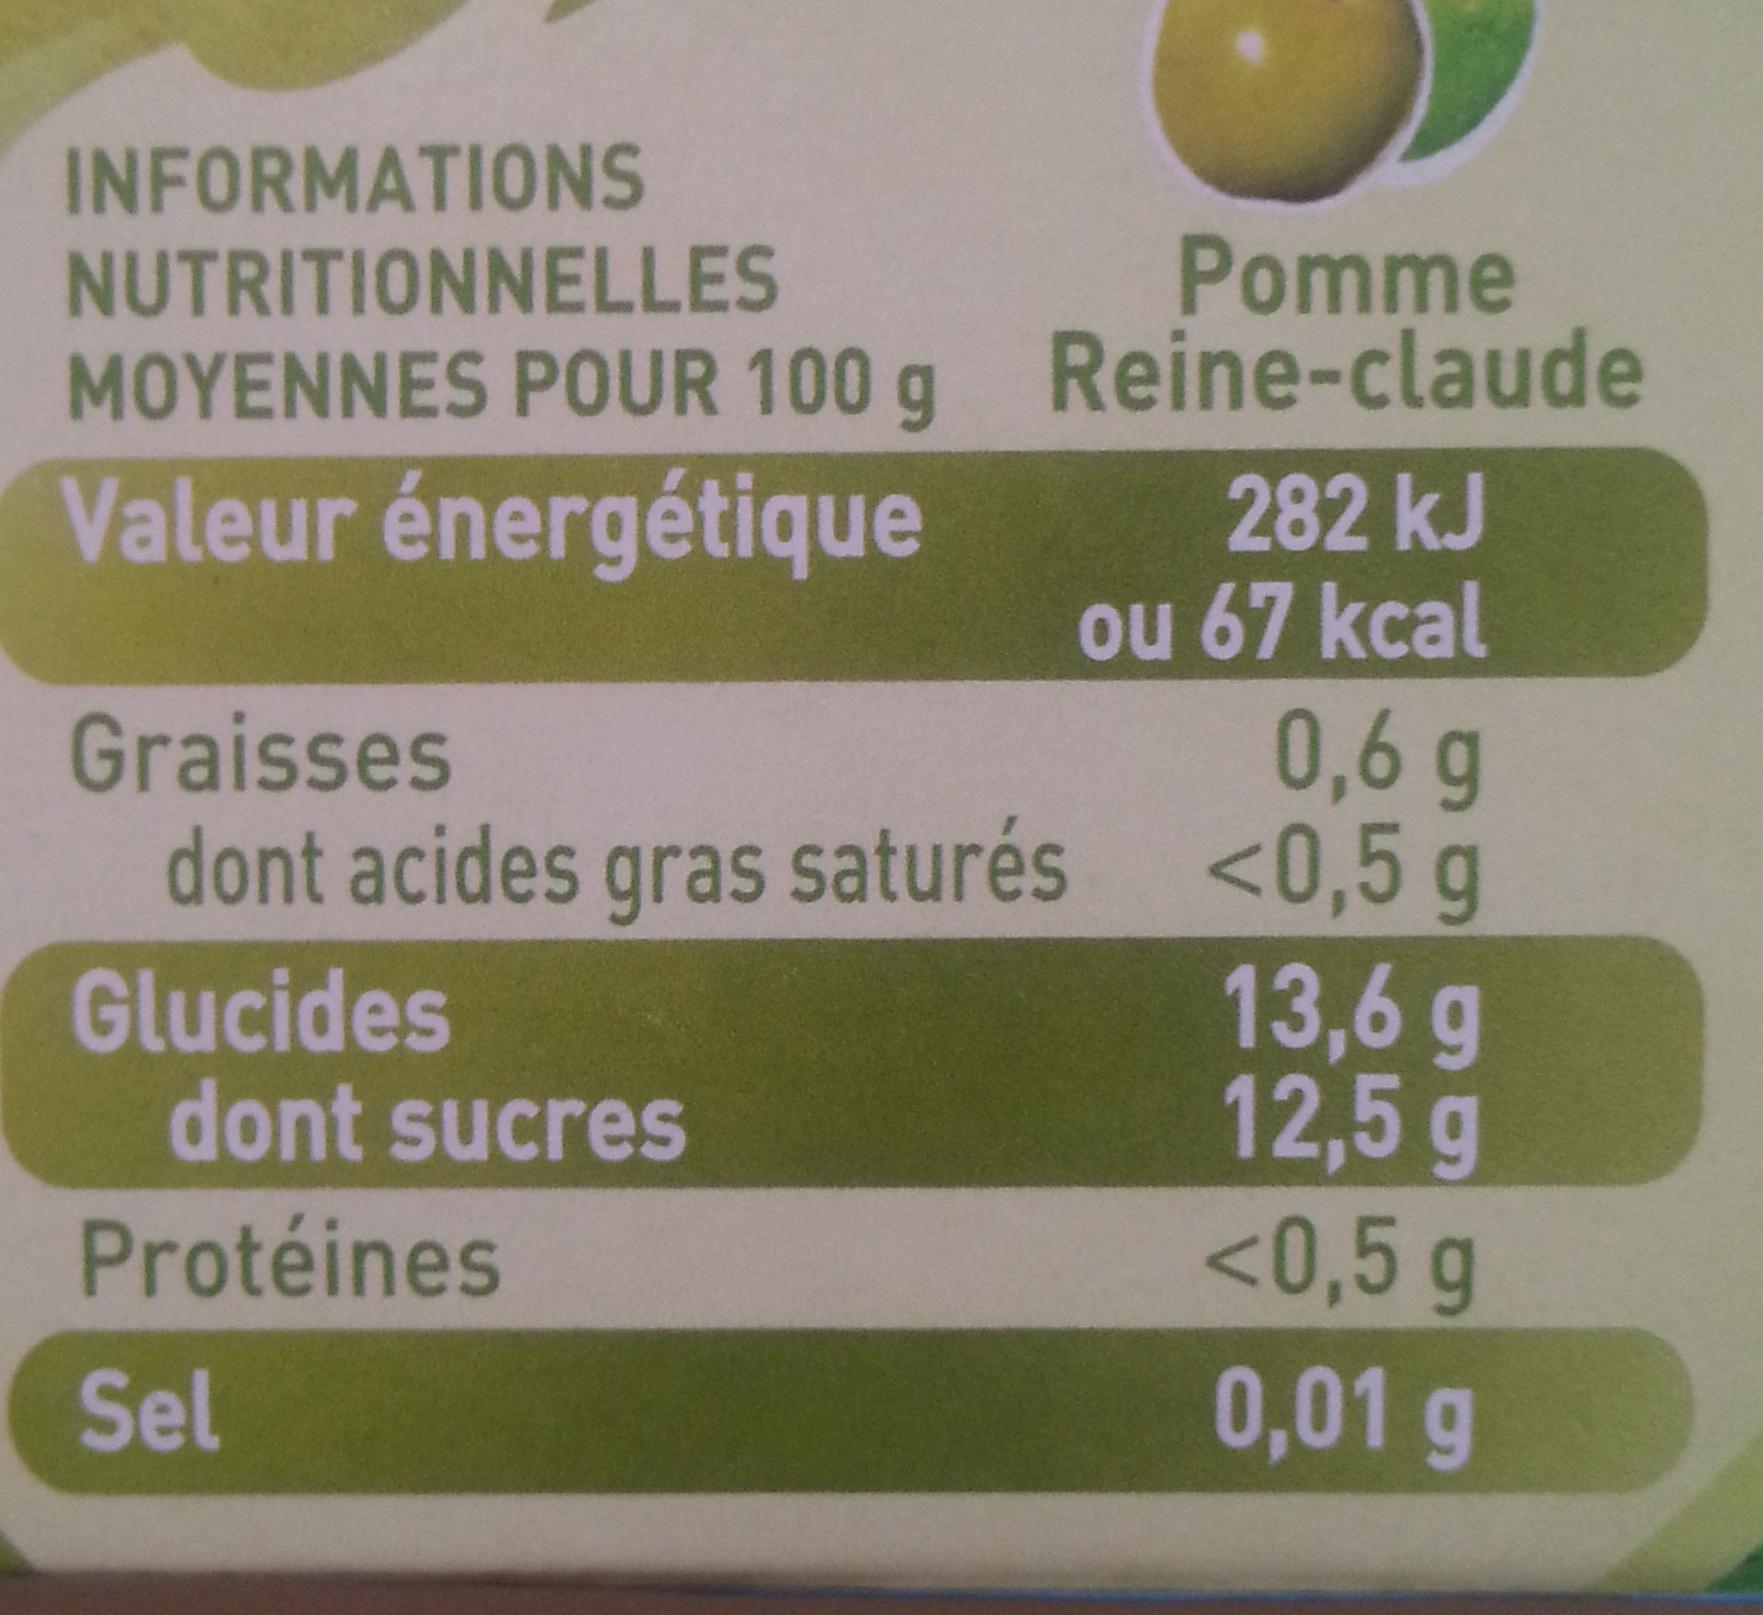 Pom'Potes Pomme Reine-Claude - Informations nutritionnelles - fr